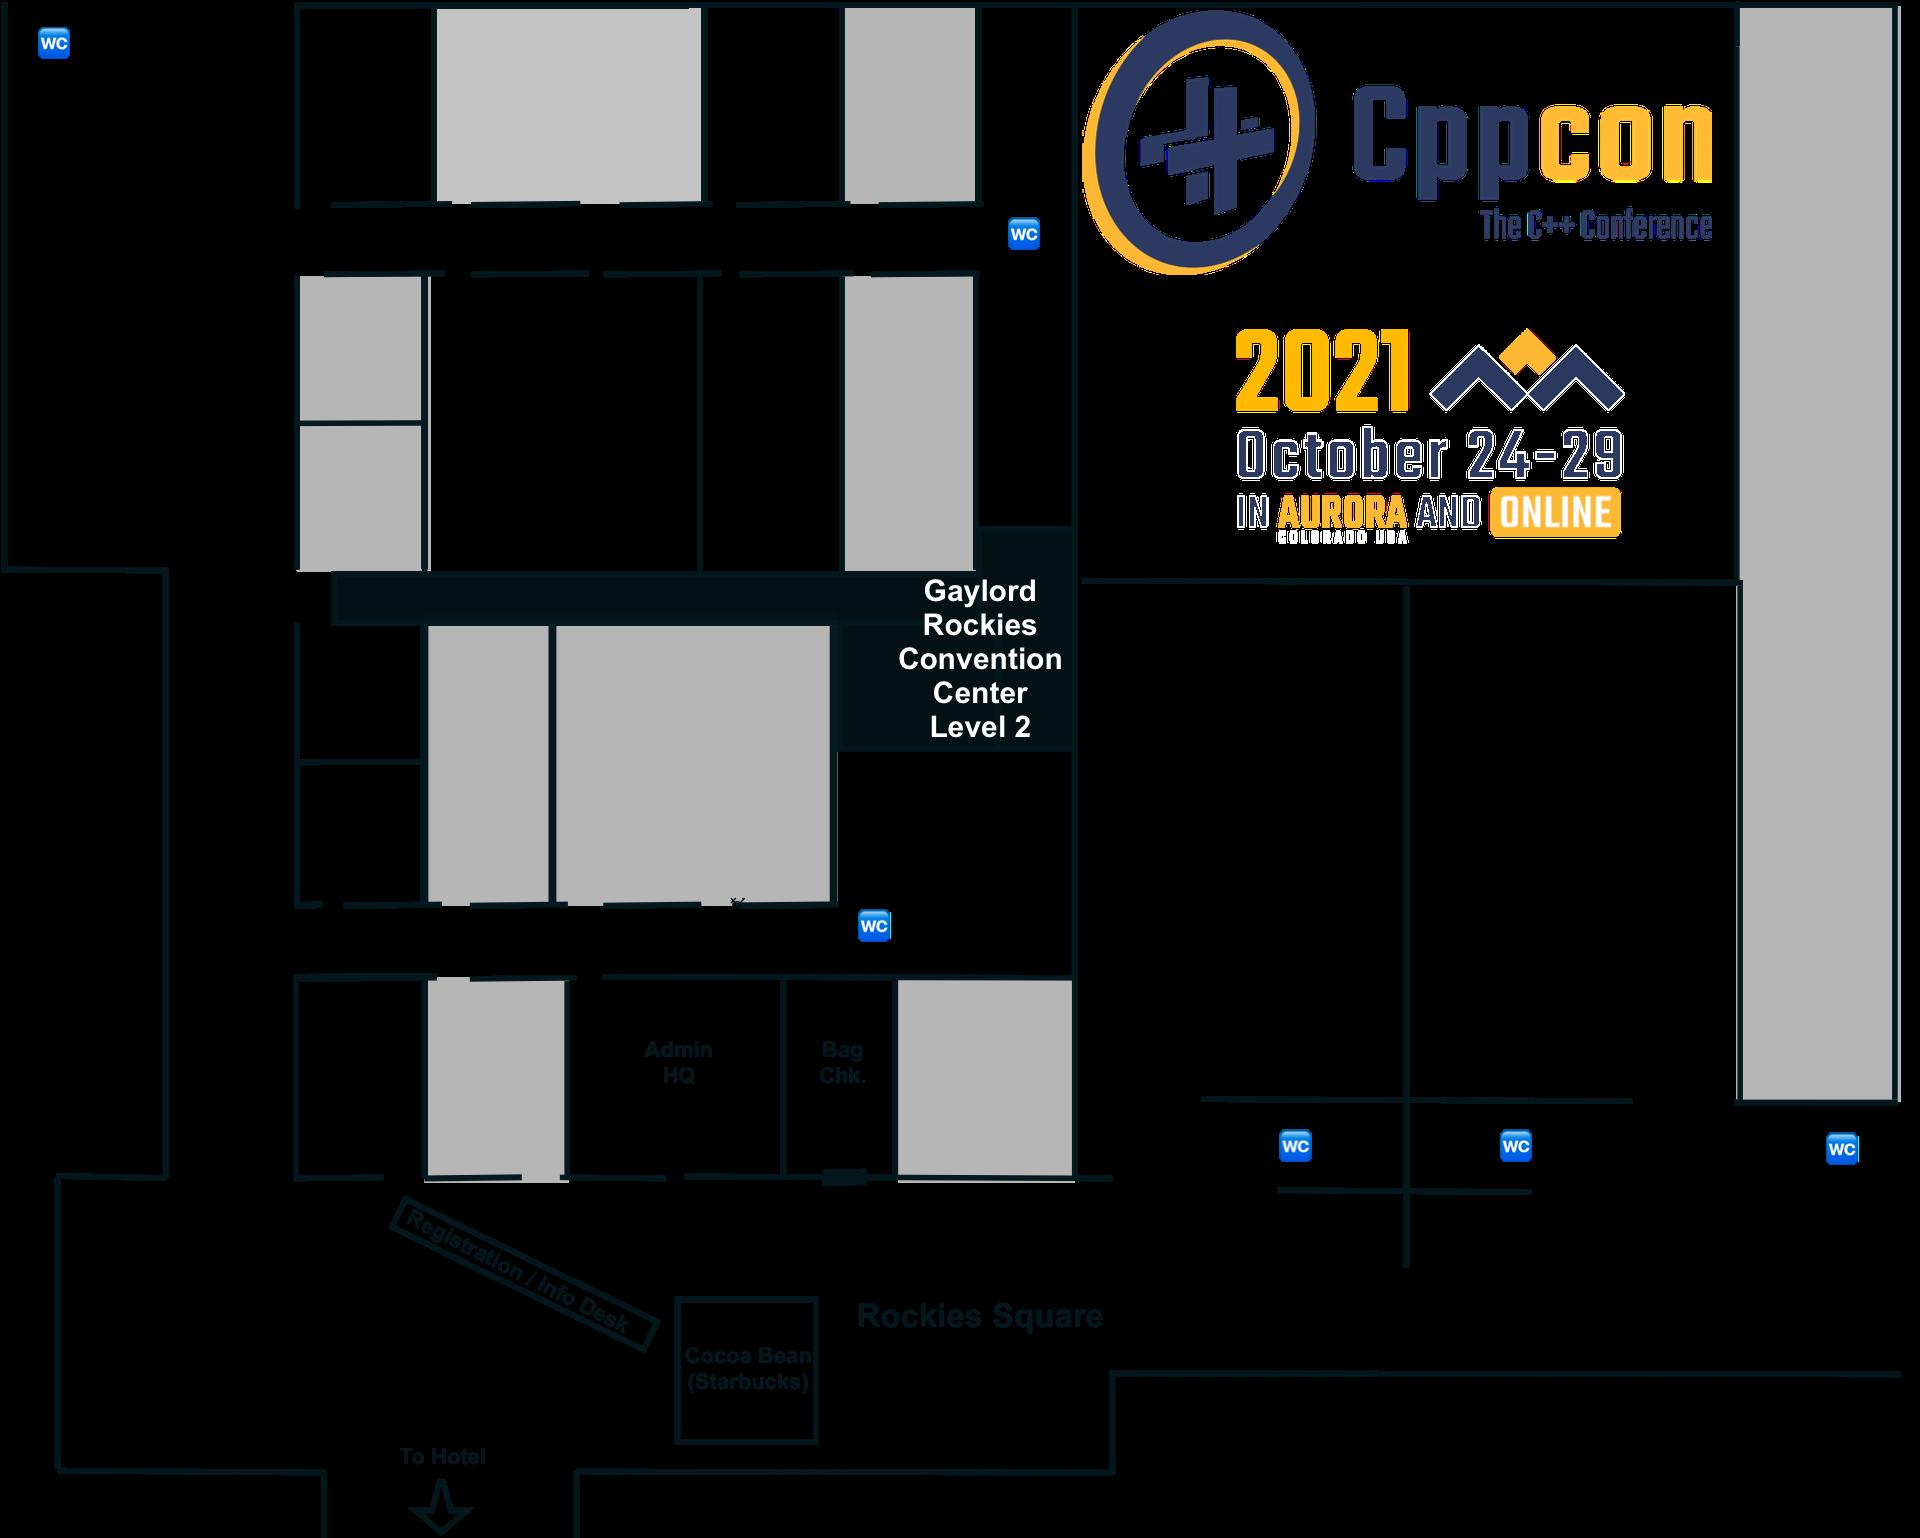 CppCon 2021 Map